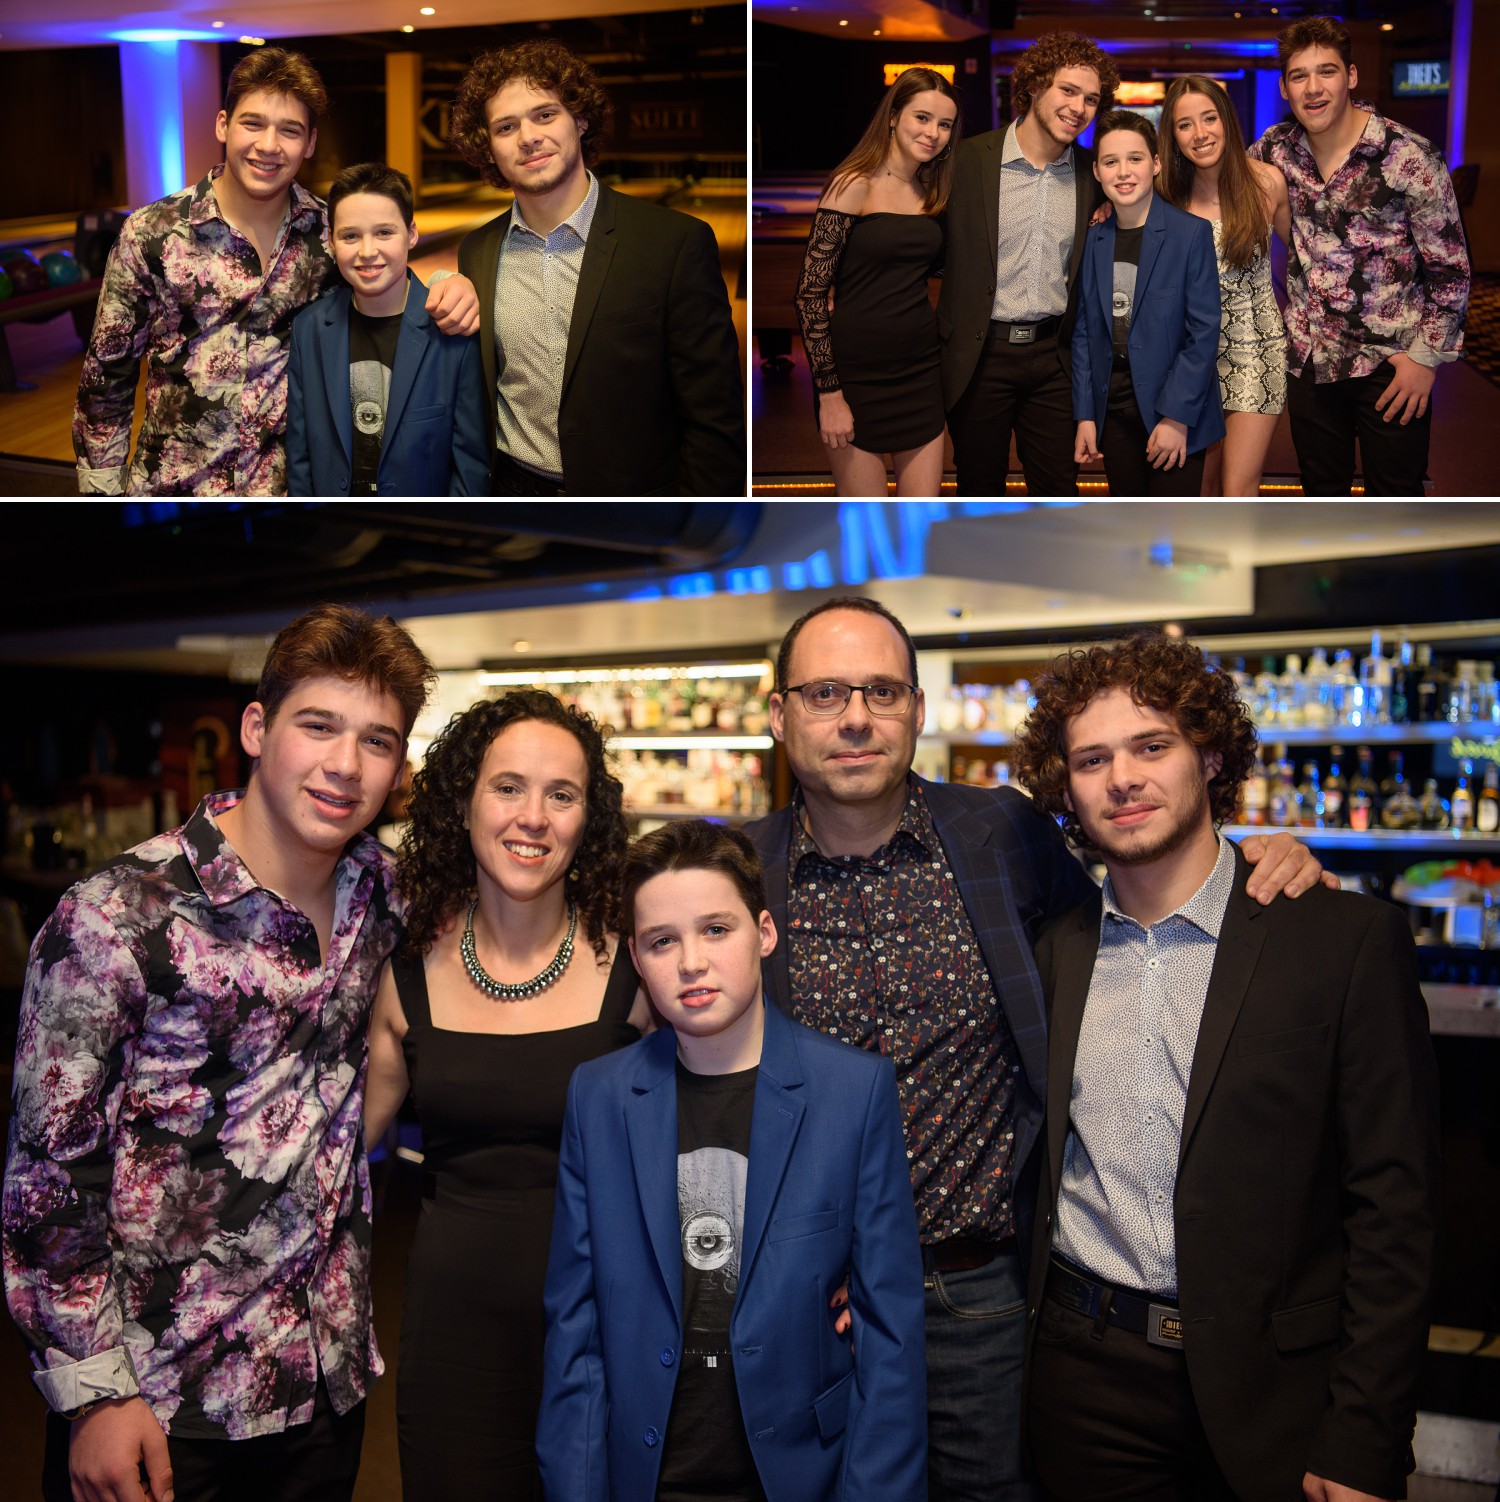 barmitzvah party london 04